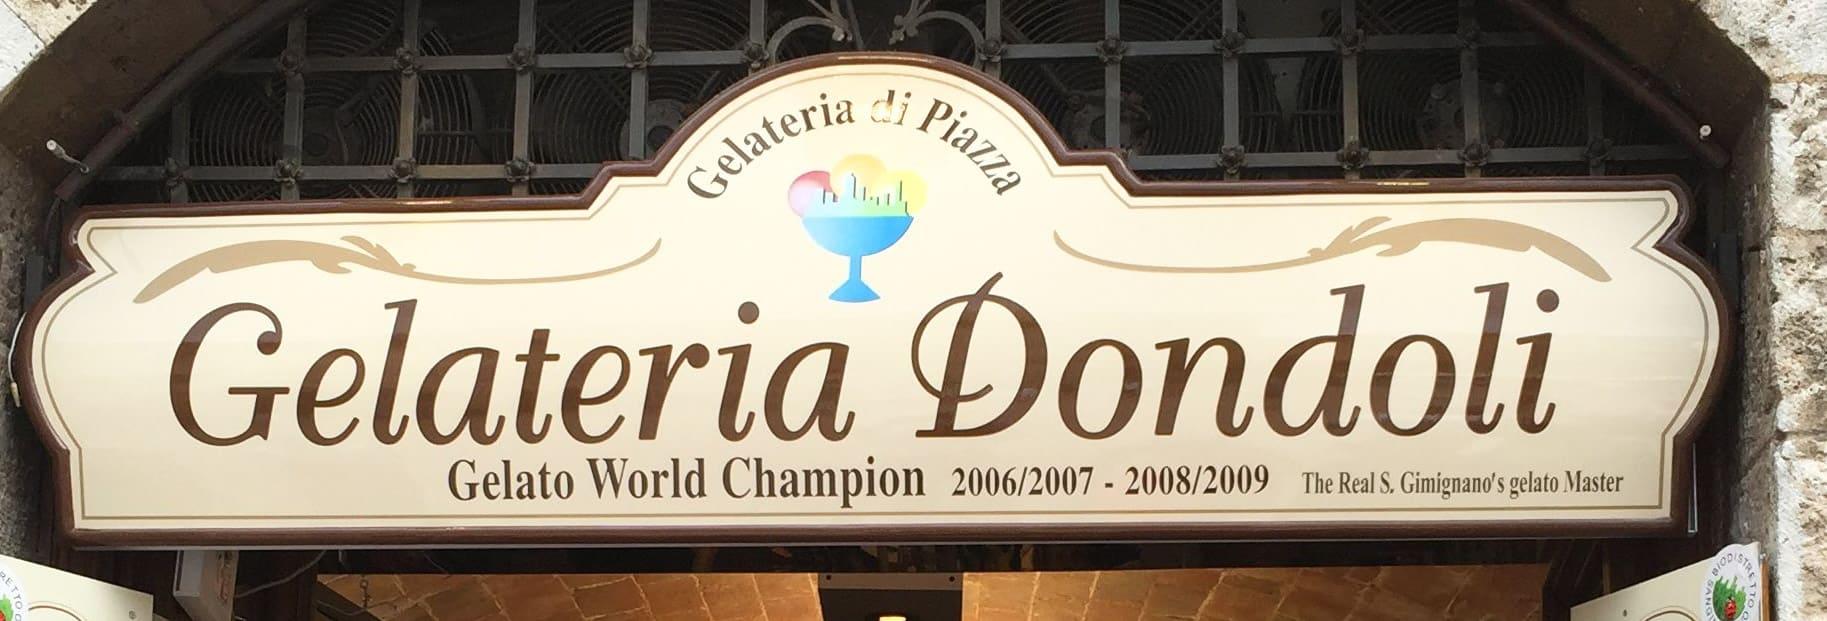 Gelateria Dondoli, San G.